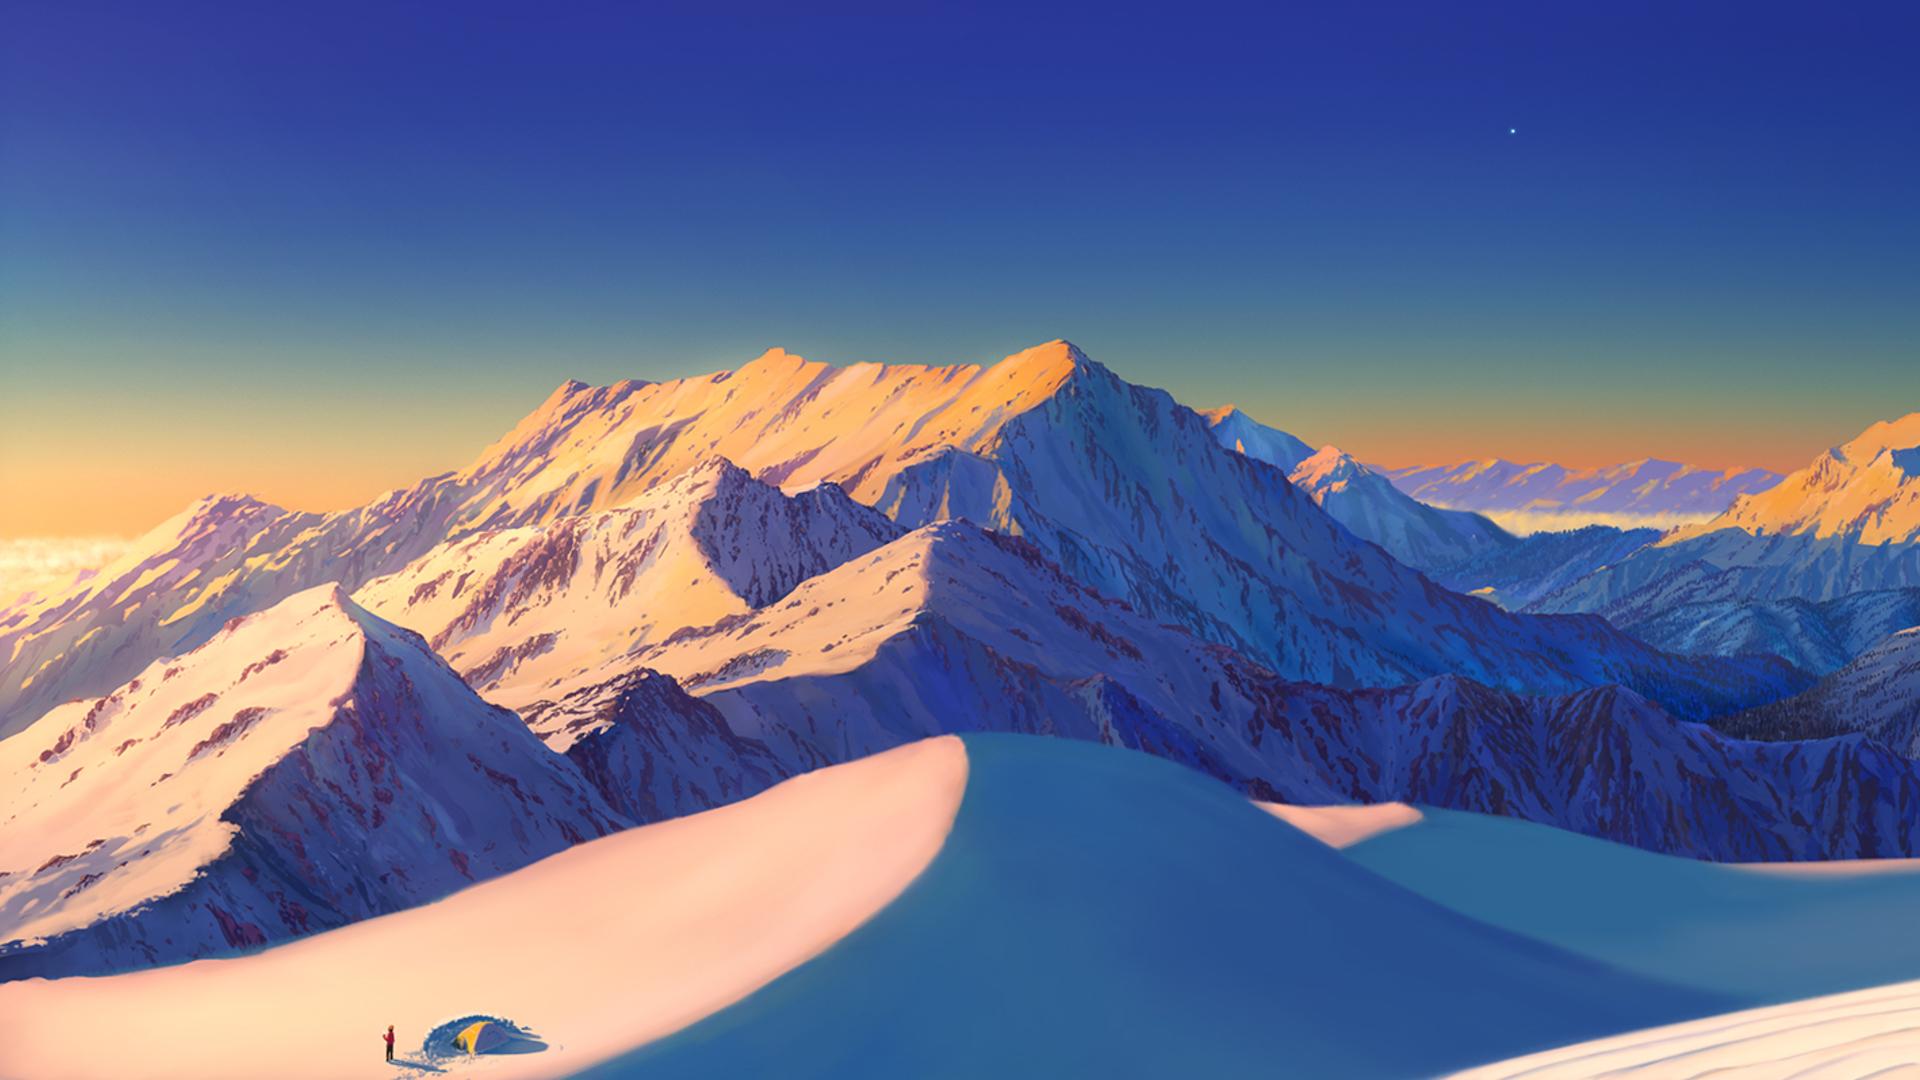 1920x1080 Snowy Mountains 1080p Laptop Full Hd Wallpaper Hd